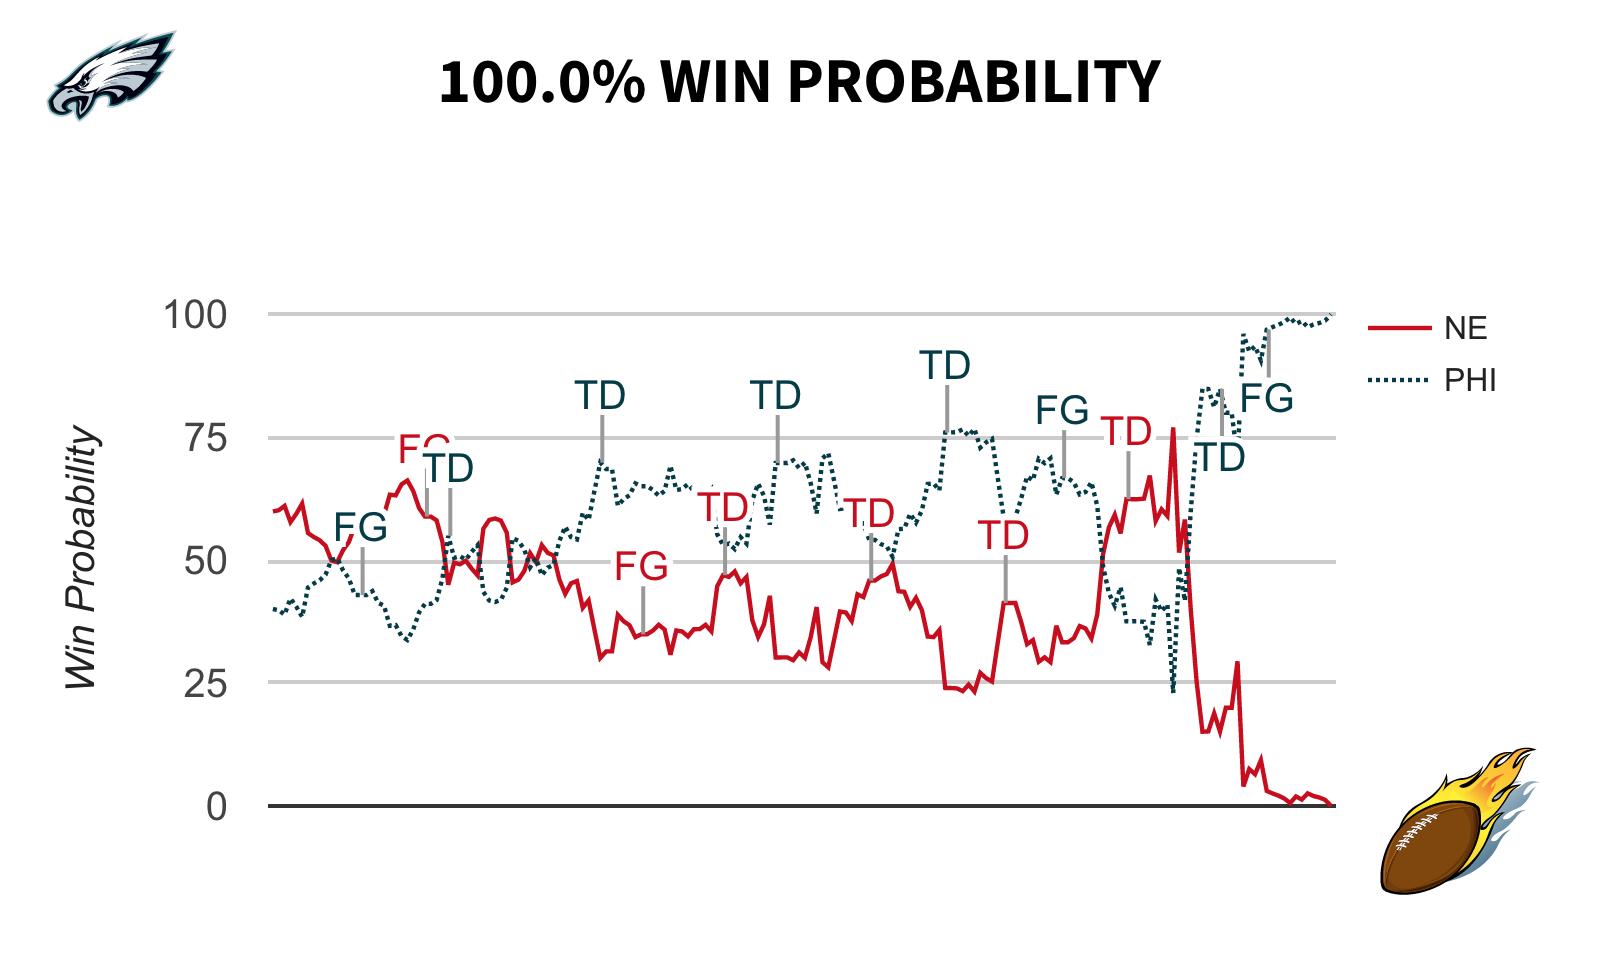 Win Expectancy Graph Super Bowl LII Philadelphia Eagles vs. New England Patriots